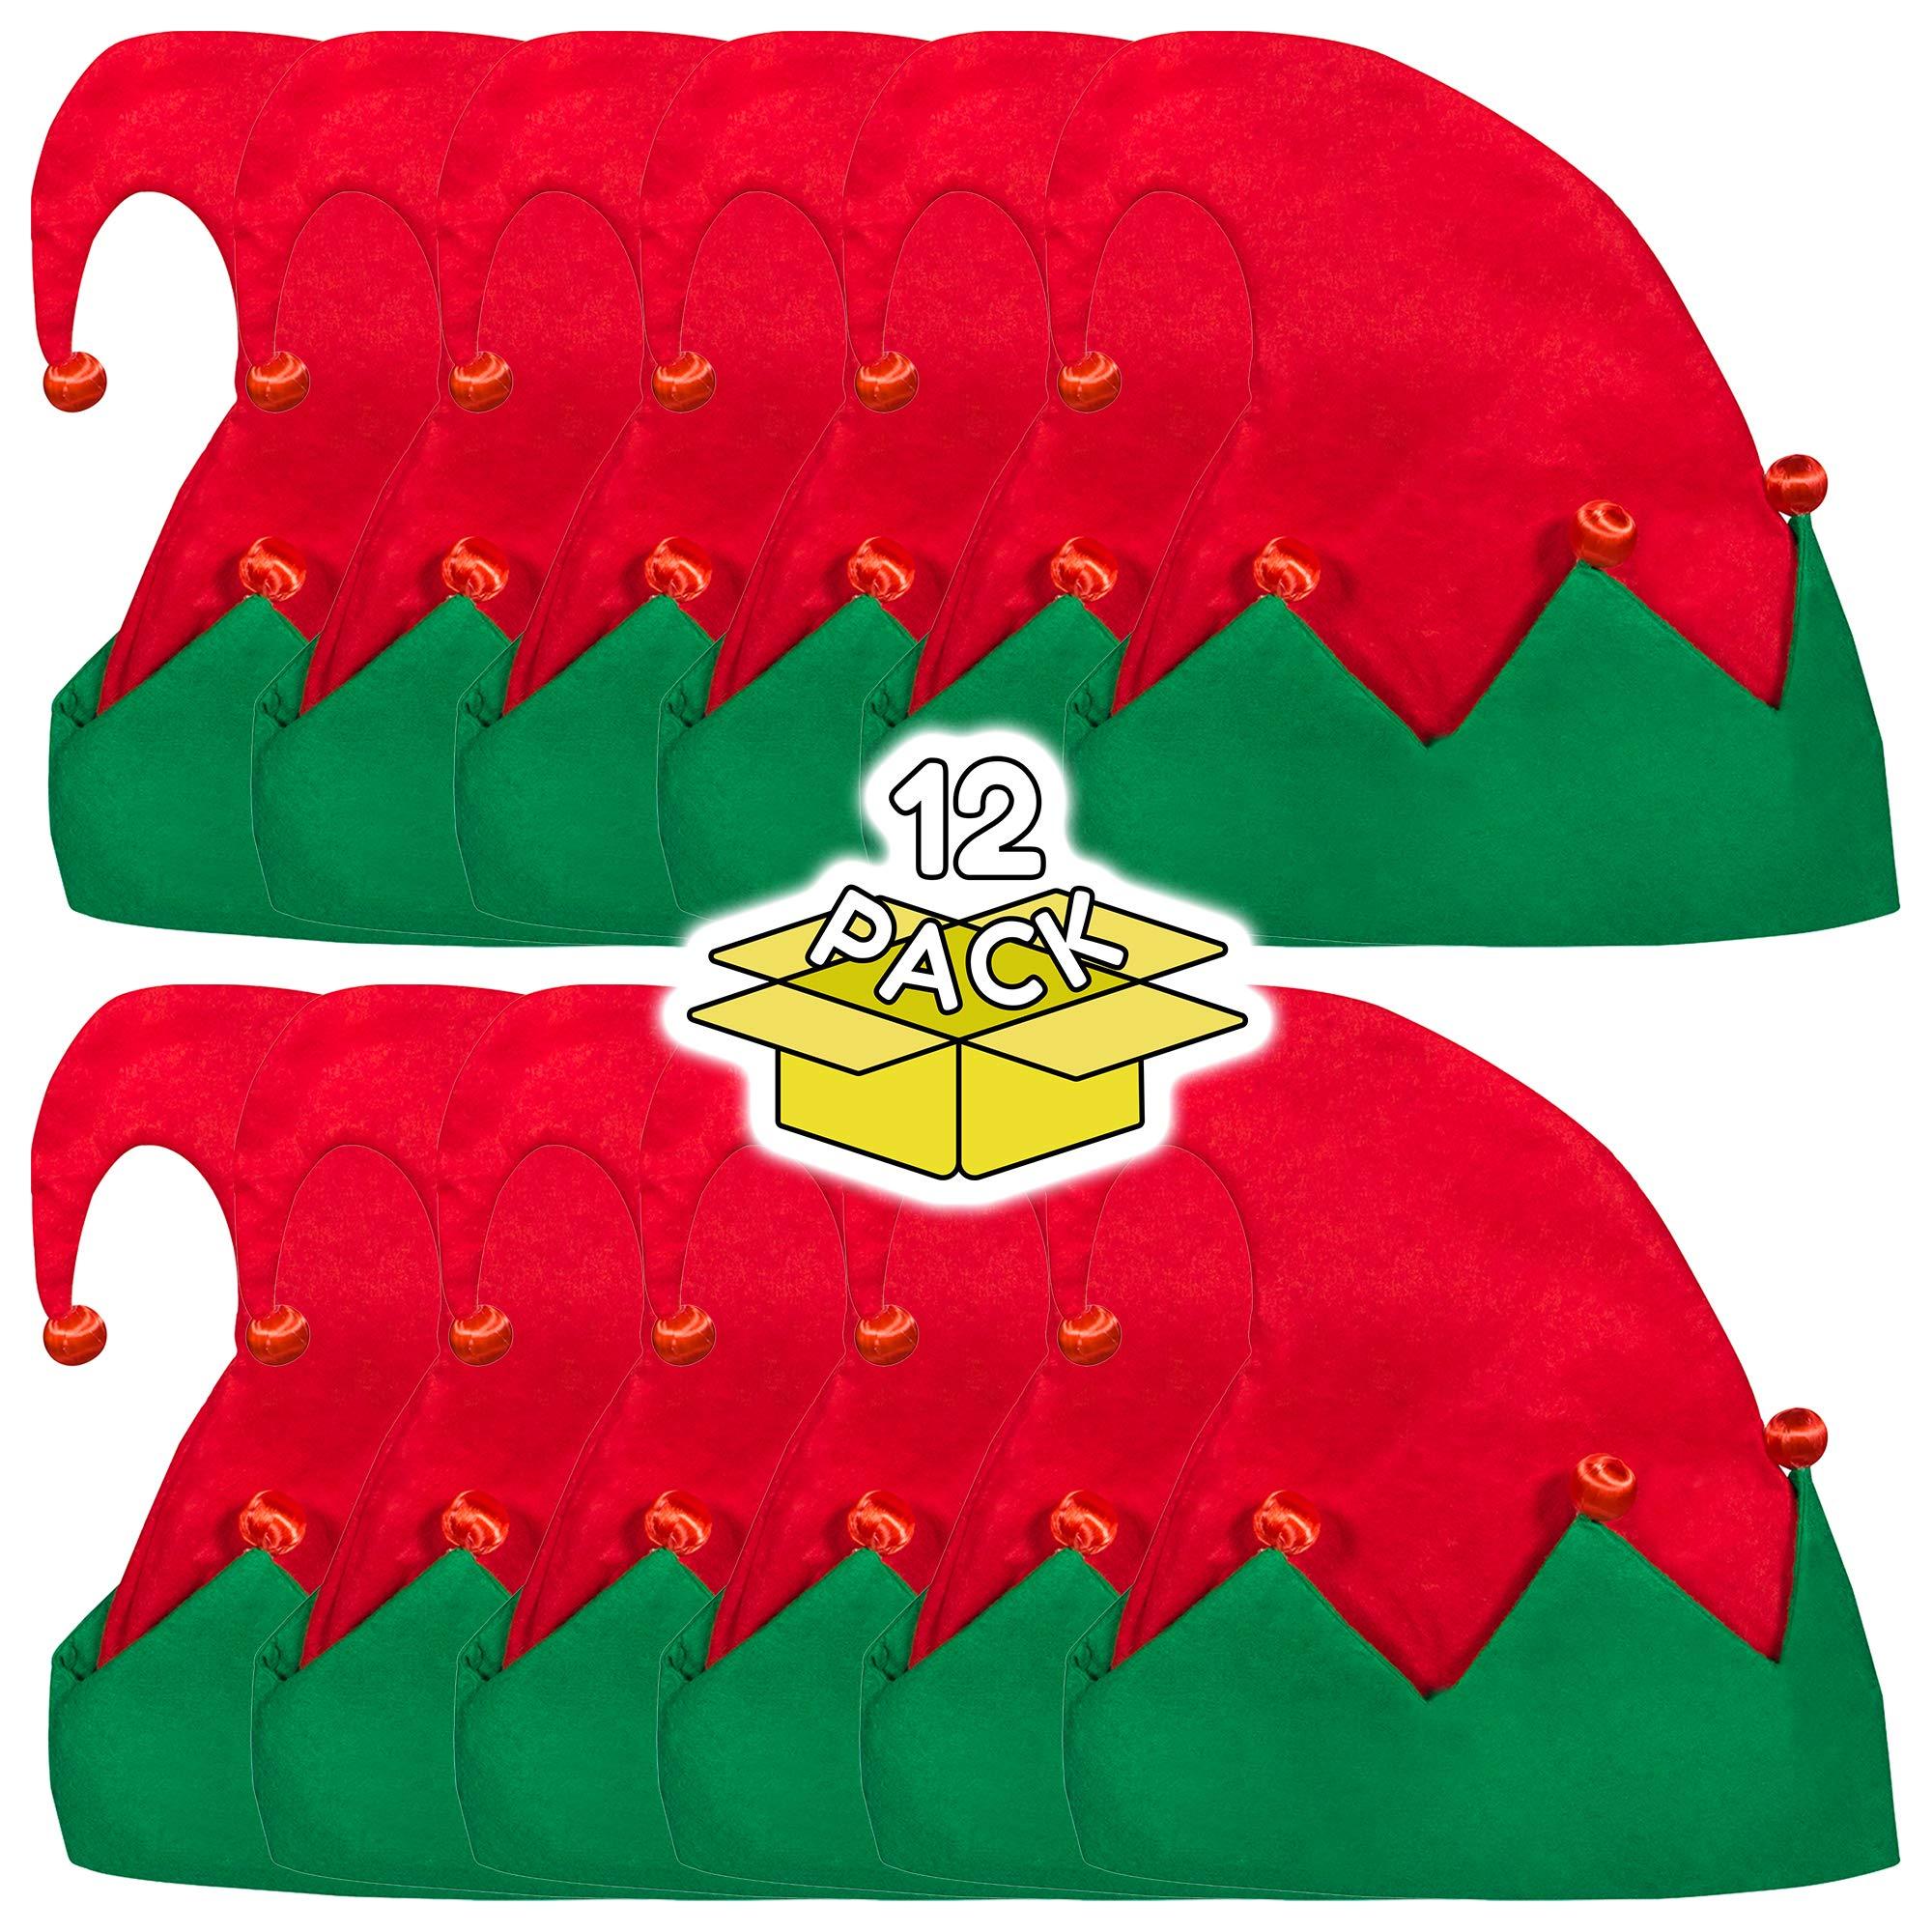 LED Light Up Festive Christmas Santa Elf Hat - Family 12 Pack by Windy City Novelties (Image #1)